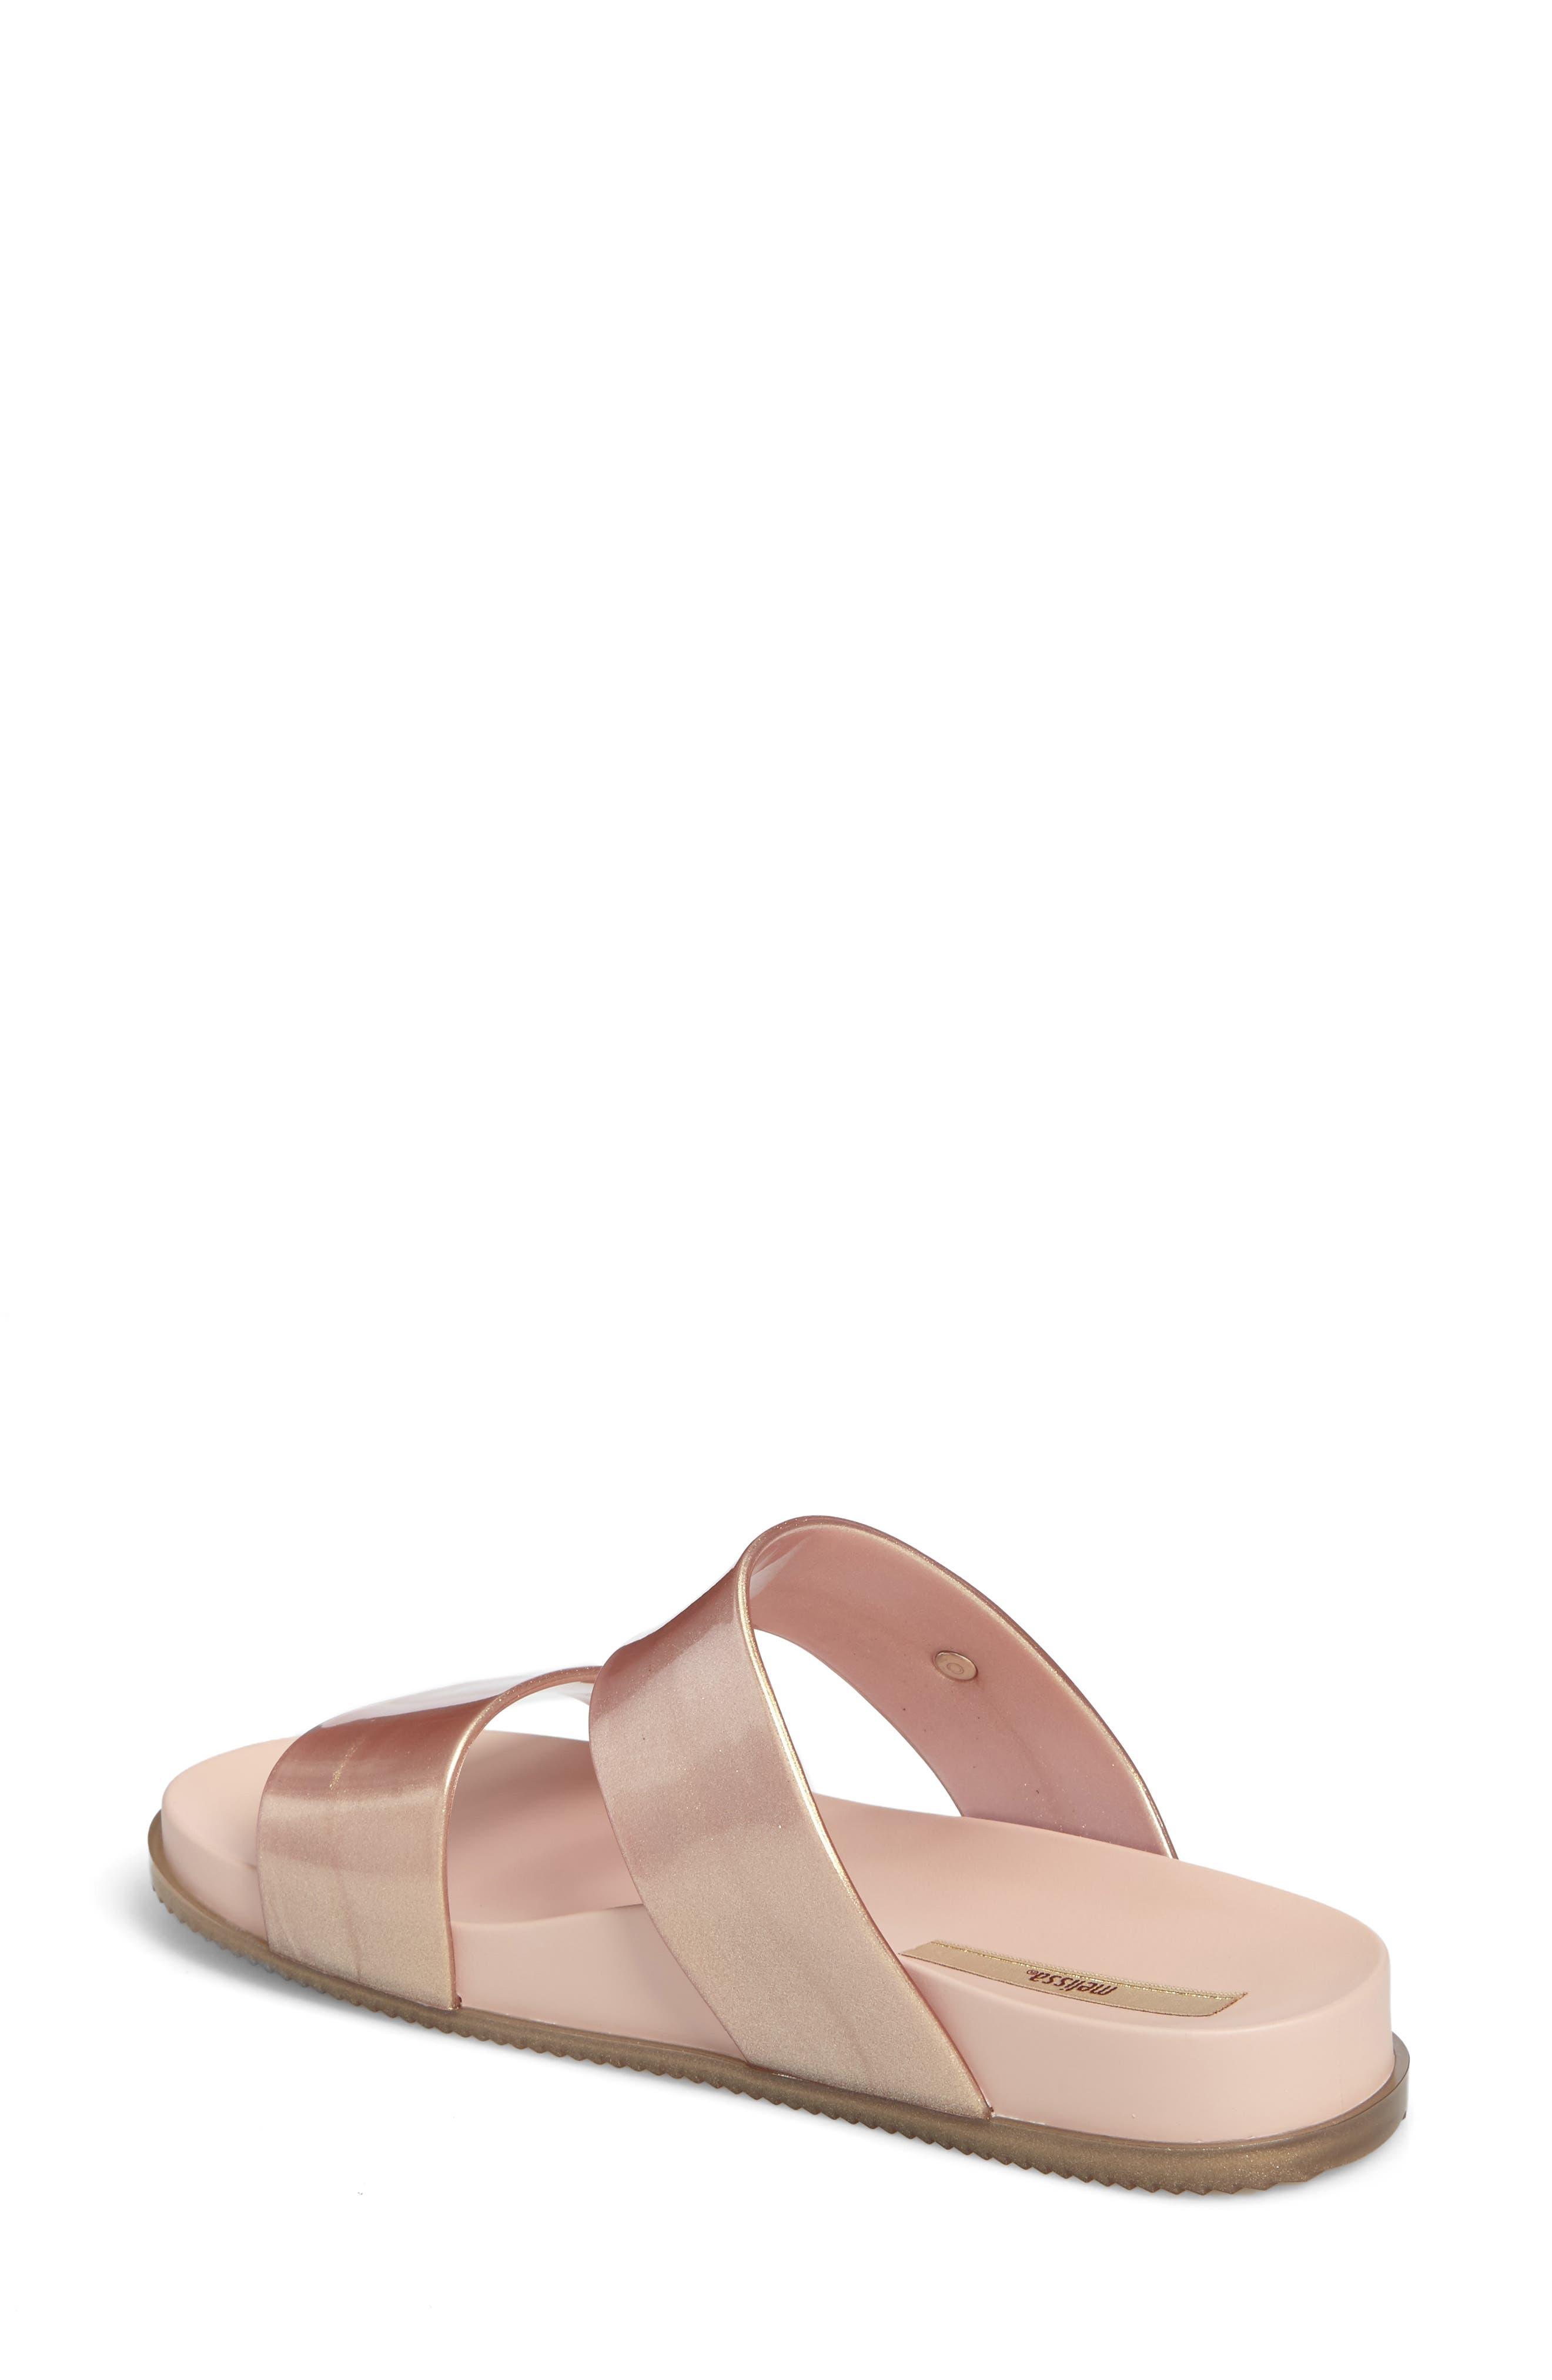 'Cosmic' Sandal,                             Alternate thumbnail 2, color,                             Metallic Pink